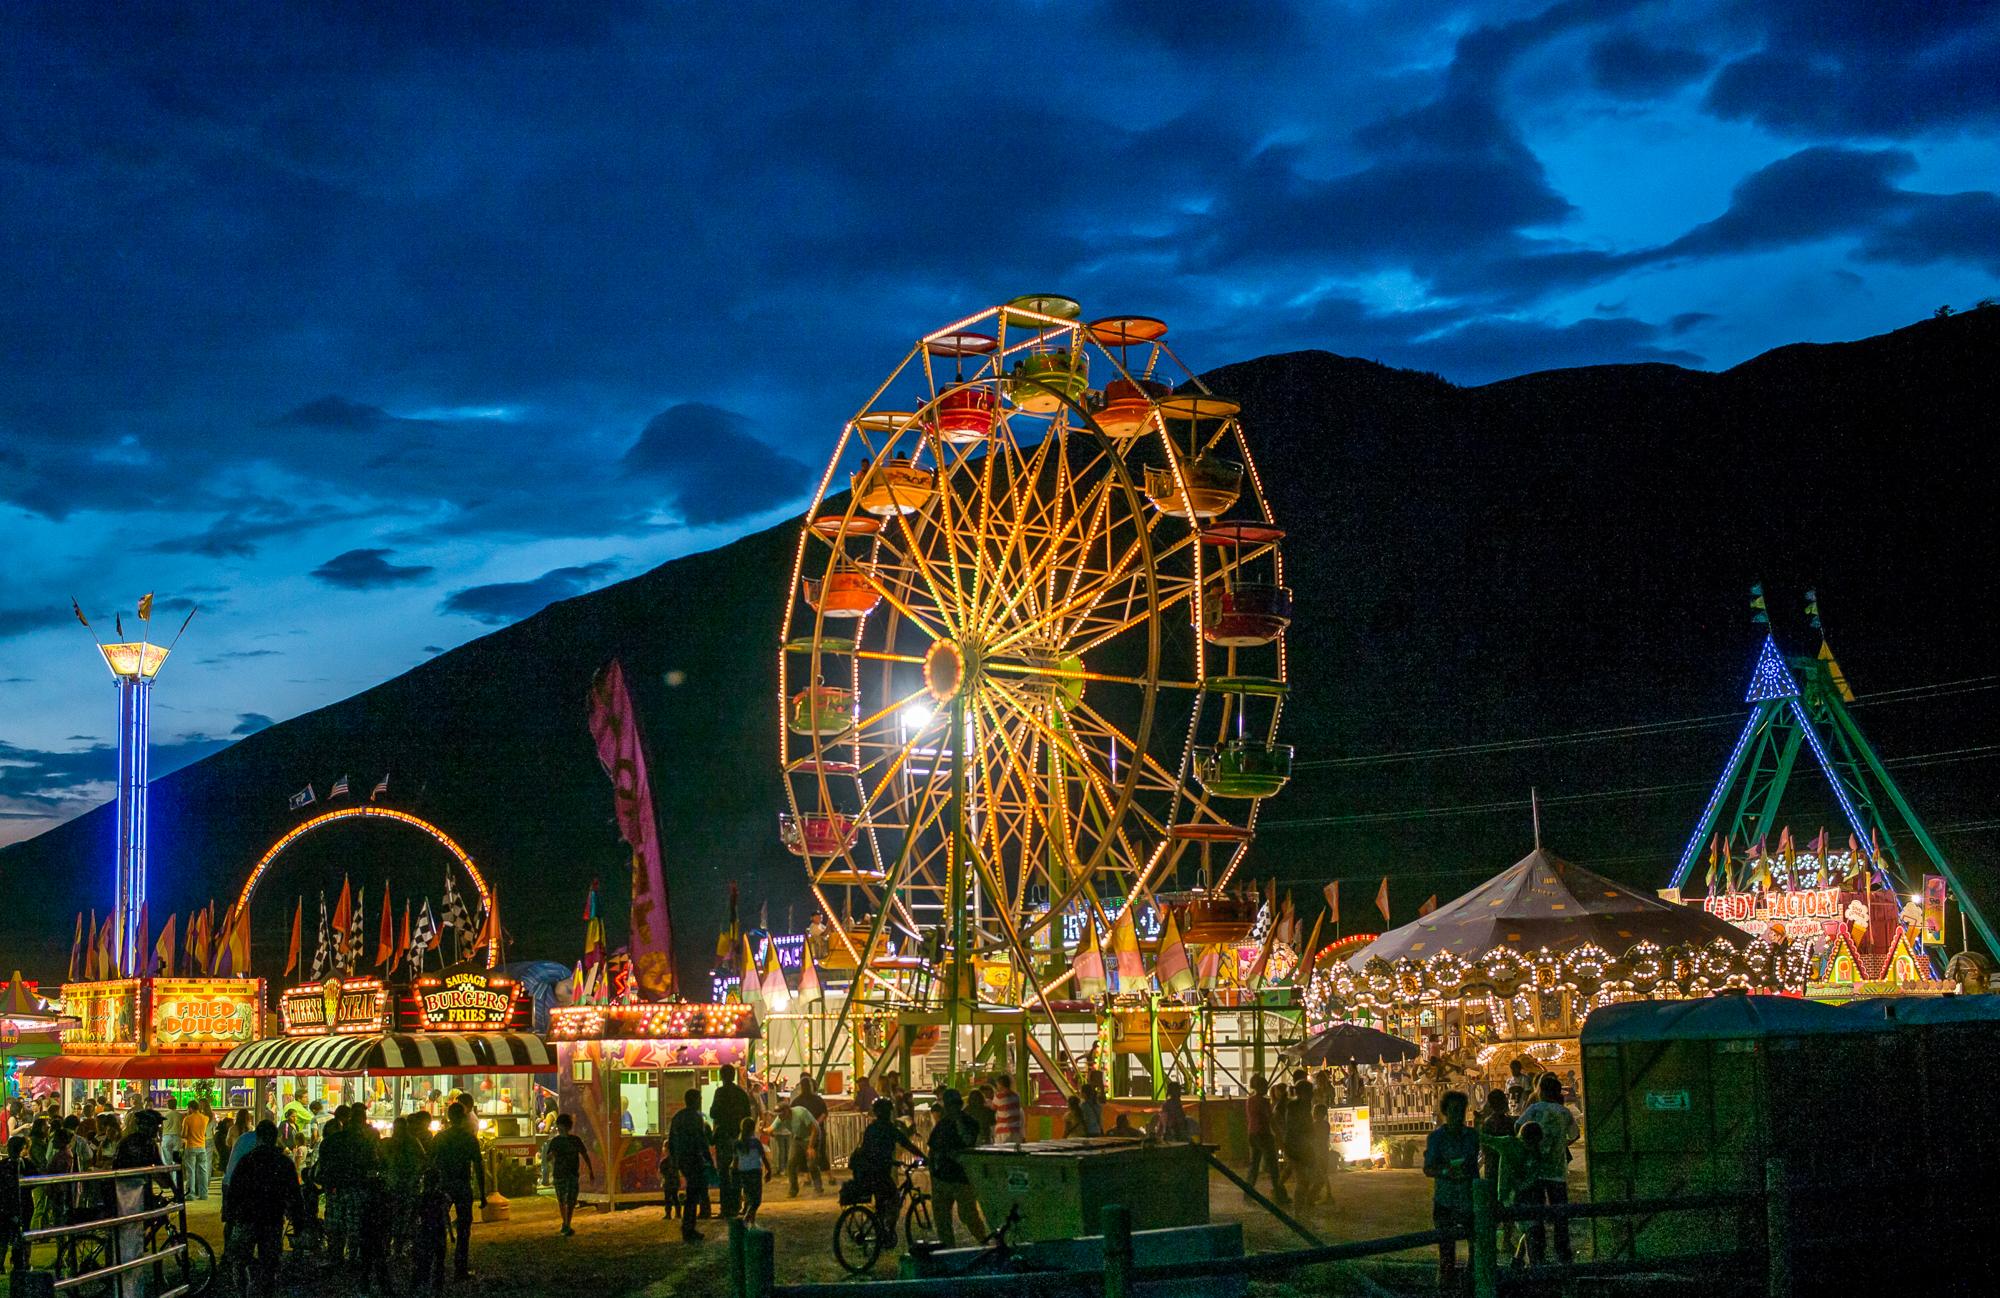 night-time-fair-1-of-1